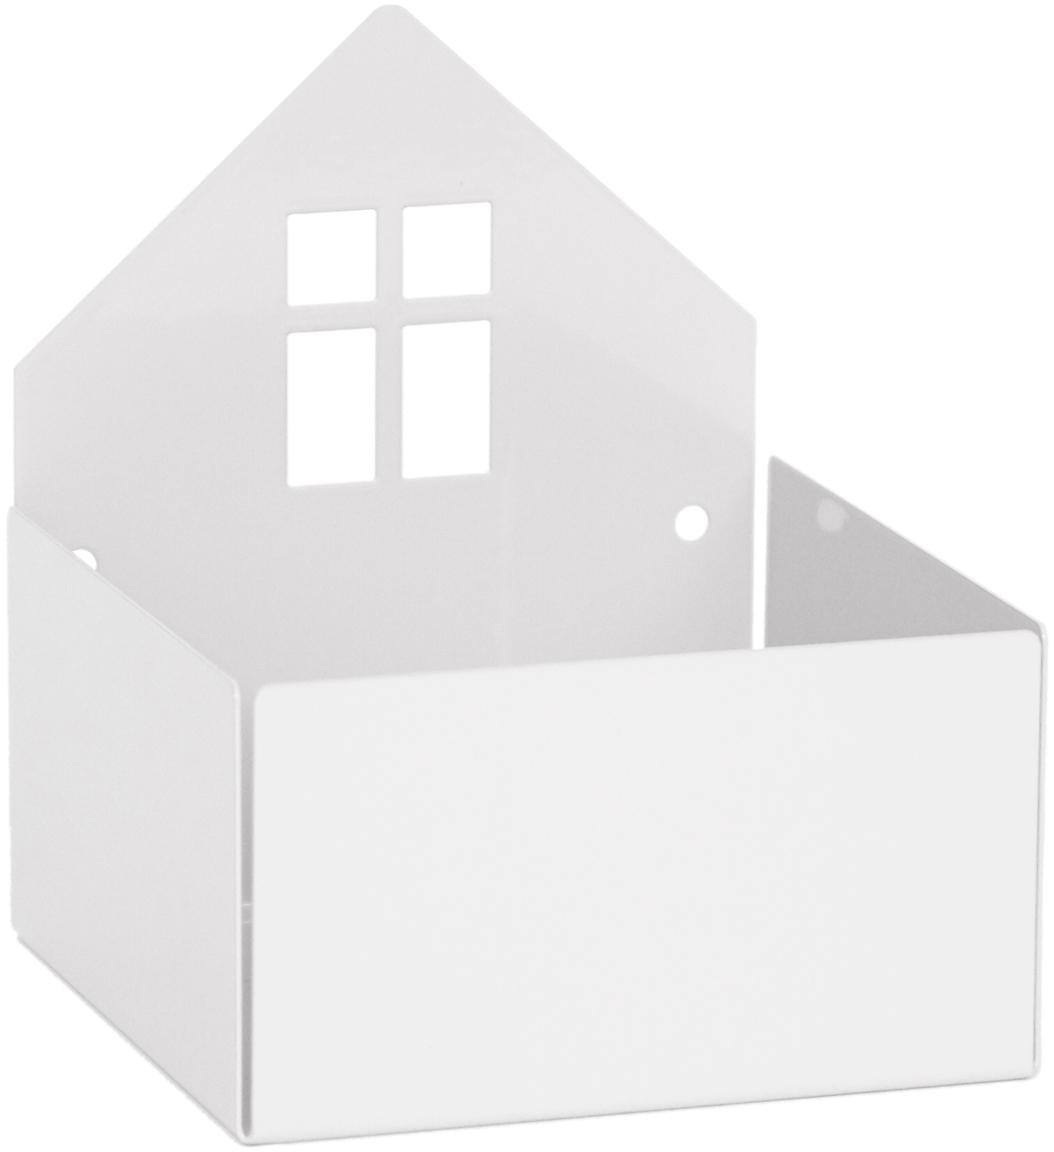 Caja Town House, Metal con pintura en polvo, Blanco, An 11 x Al 13 cm